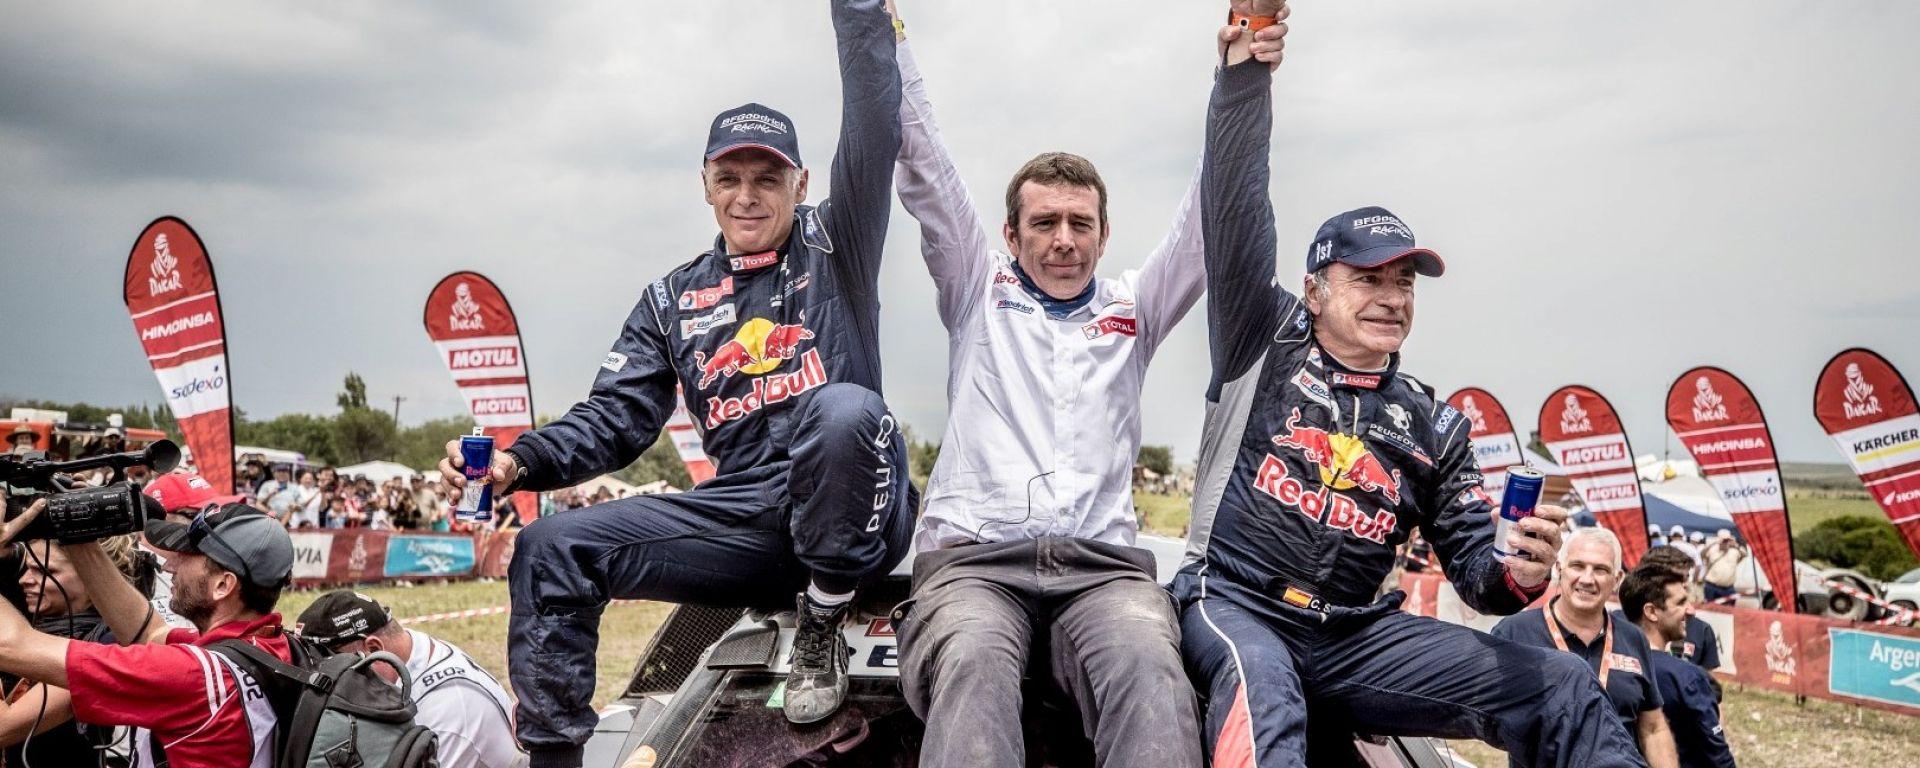 Peugeot Sport Total vince la Dakar 2018 con la 3008 di Sainz